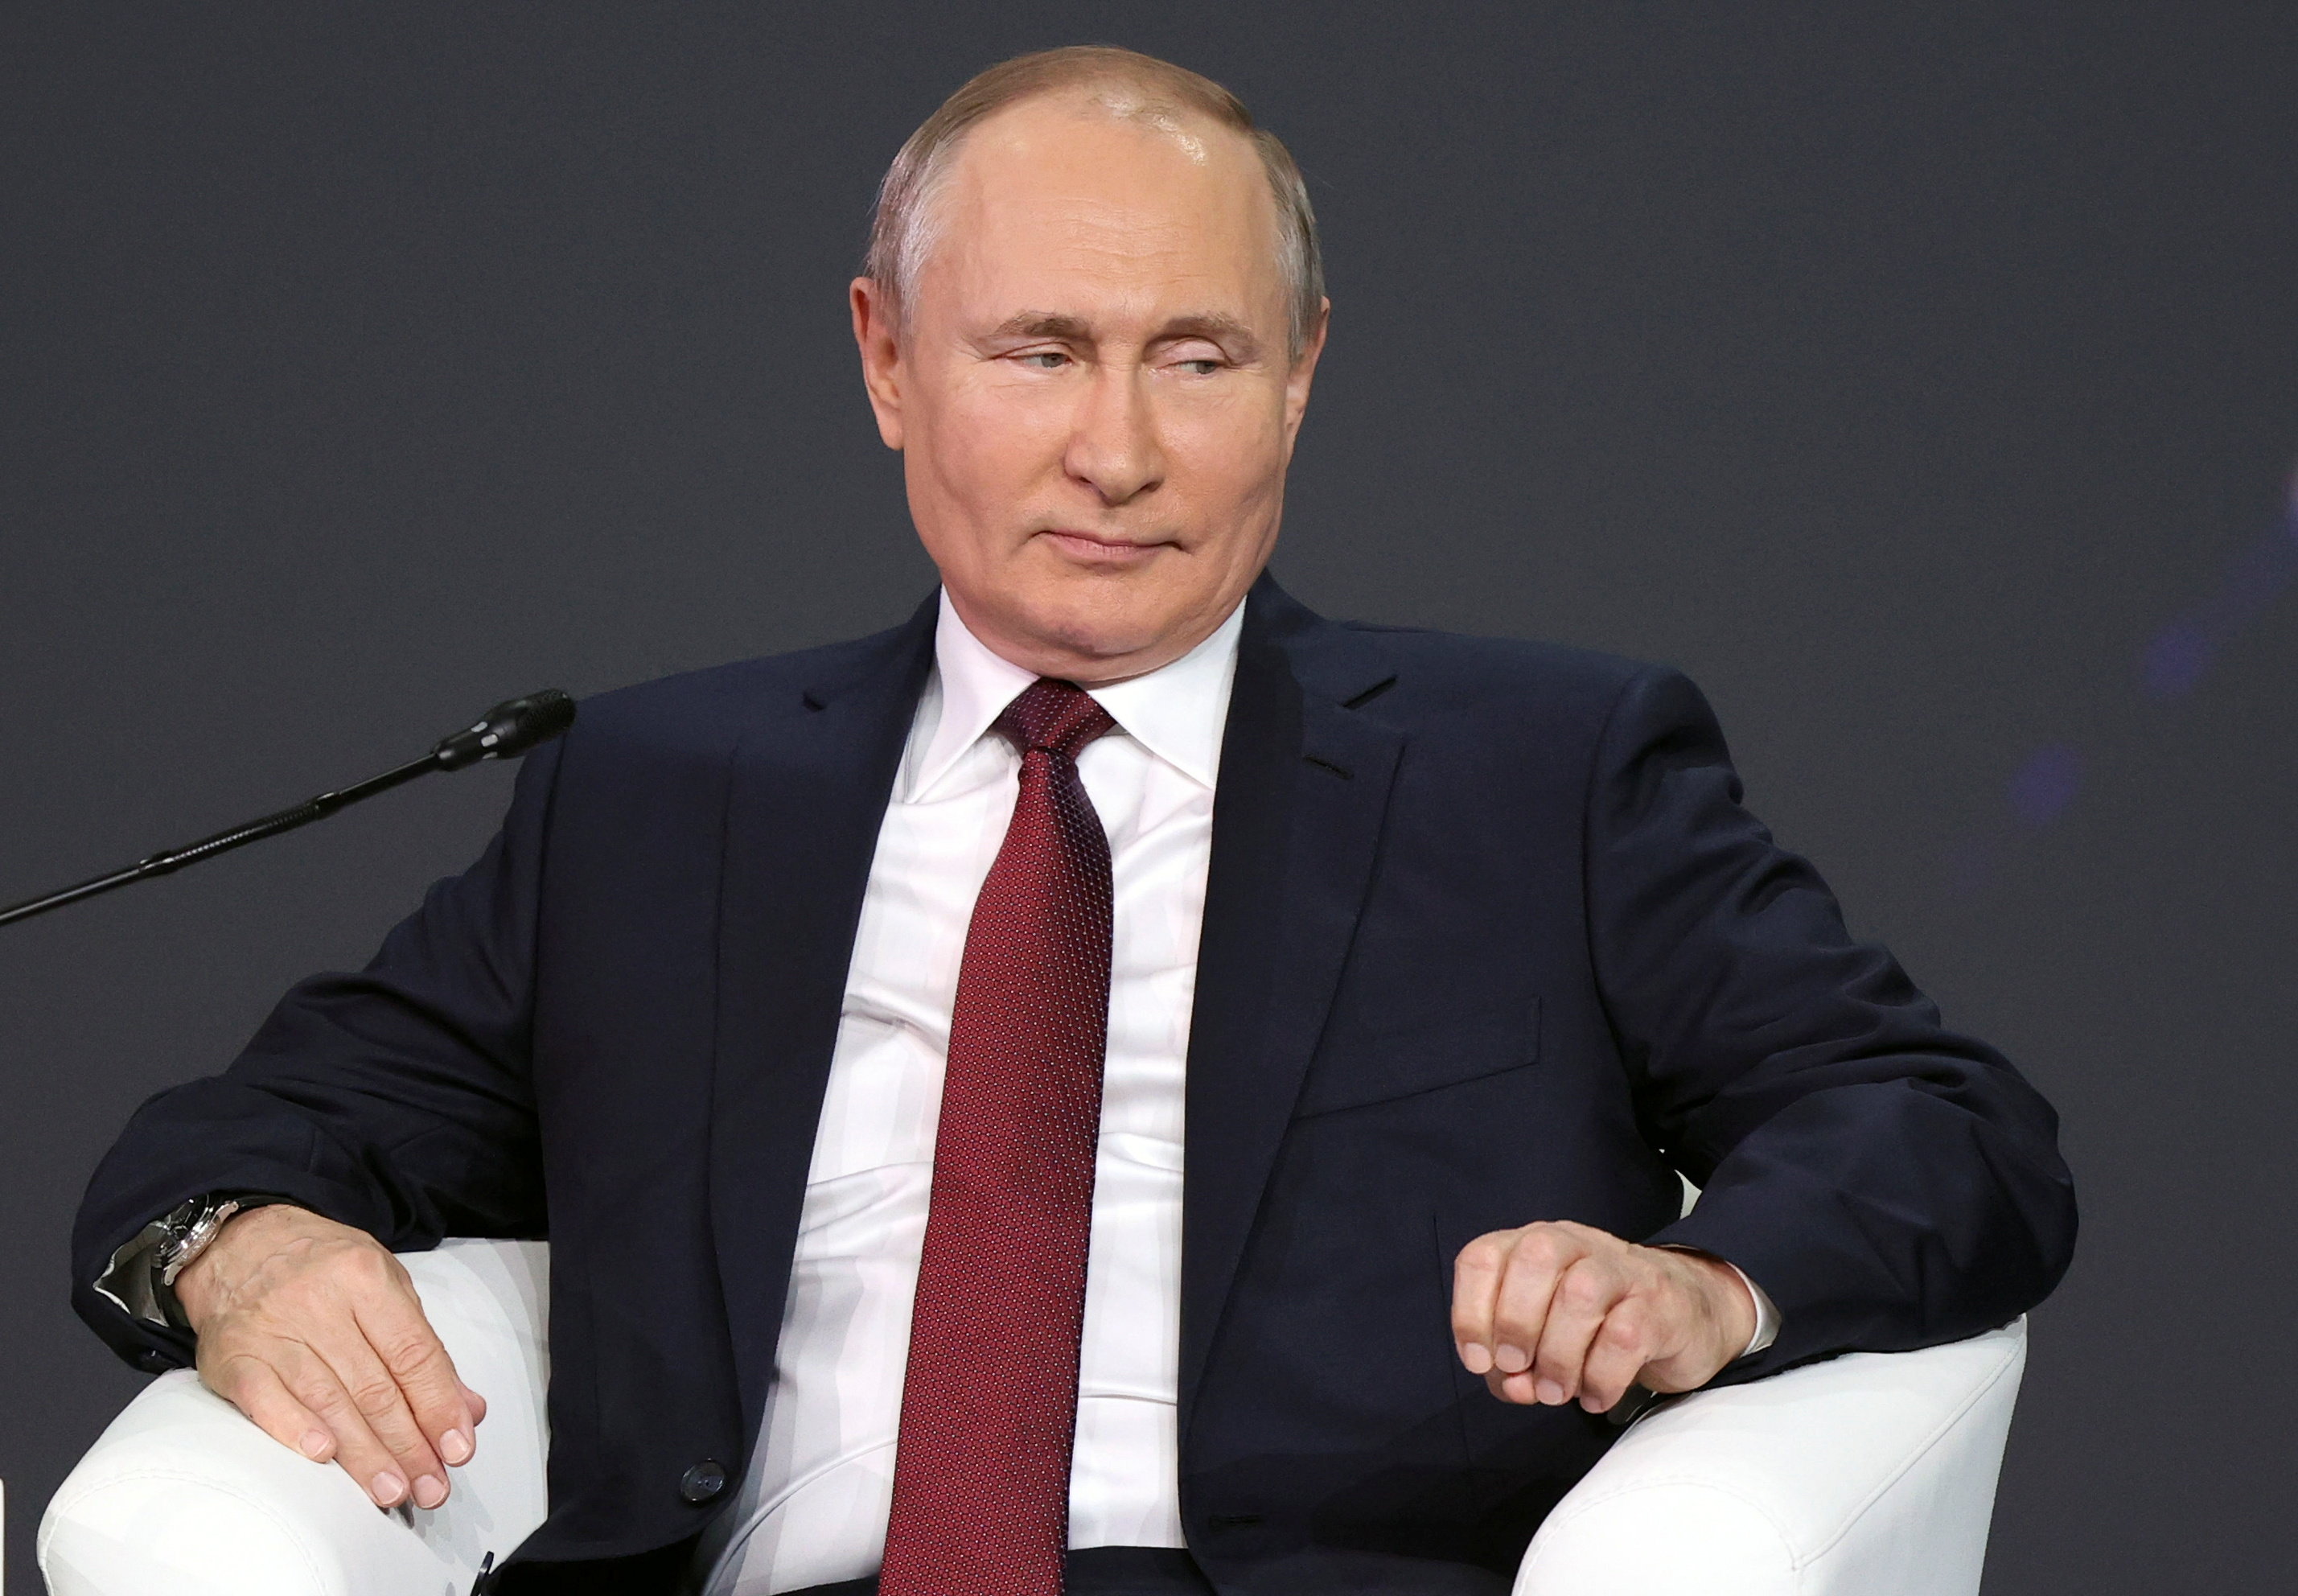 Russian President Vladimir Putin attends a session of the St. Petersburg International Economic Forum (SPIEF) in Saint Petersburg, Russia, June 4, 2021. Dmitri Lovetsky/Pool via REUTERS